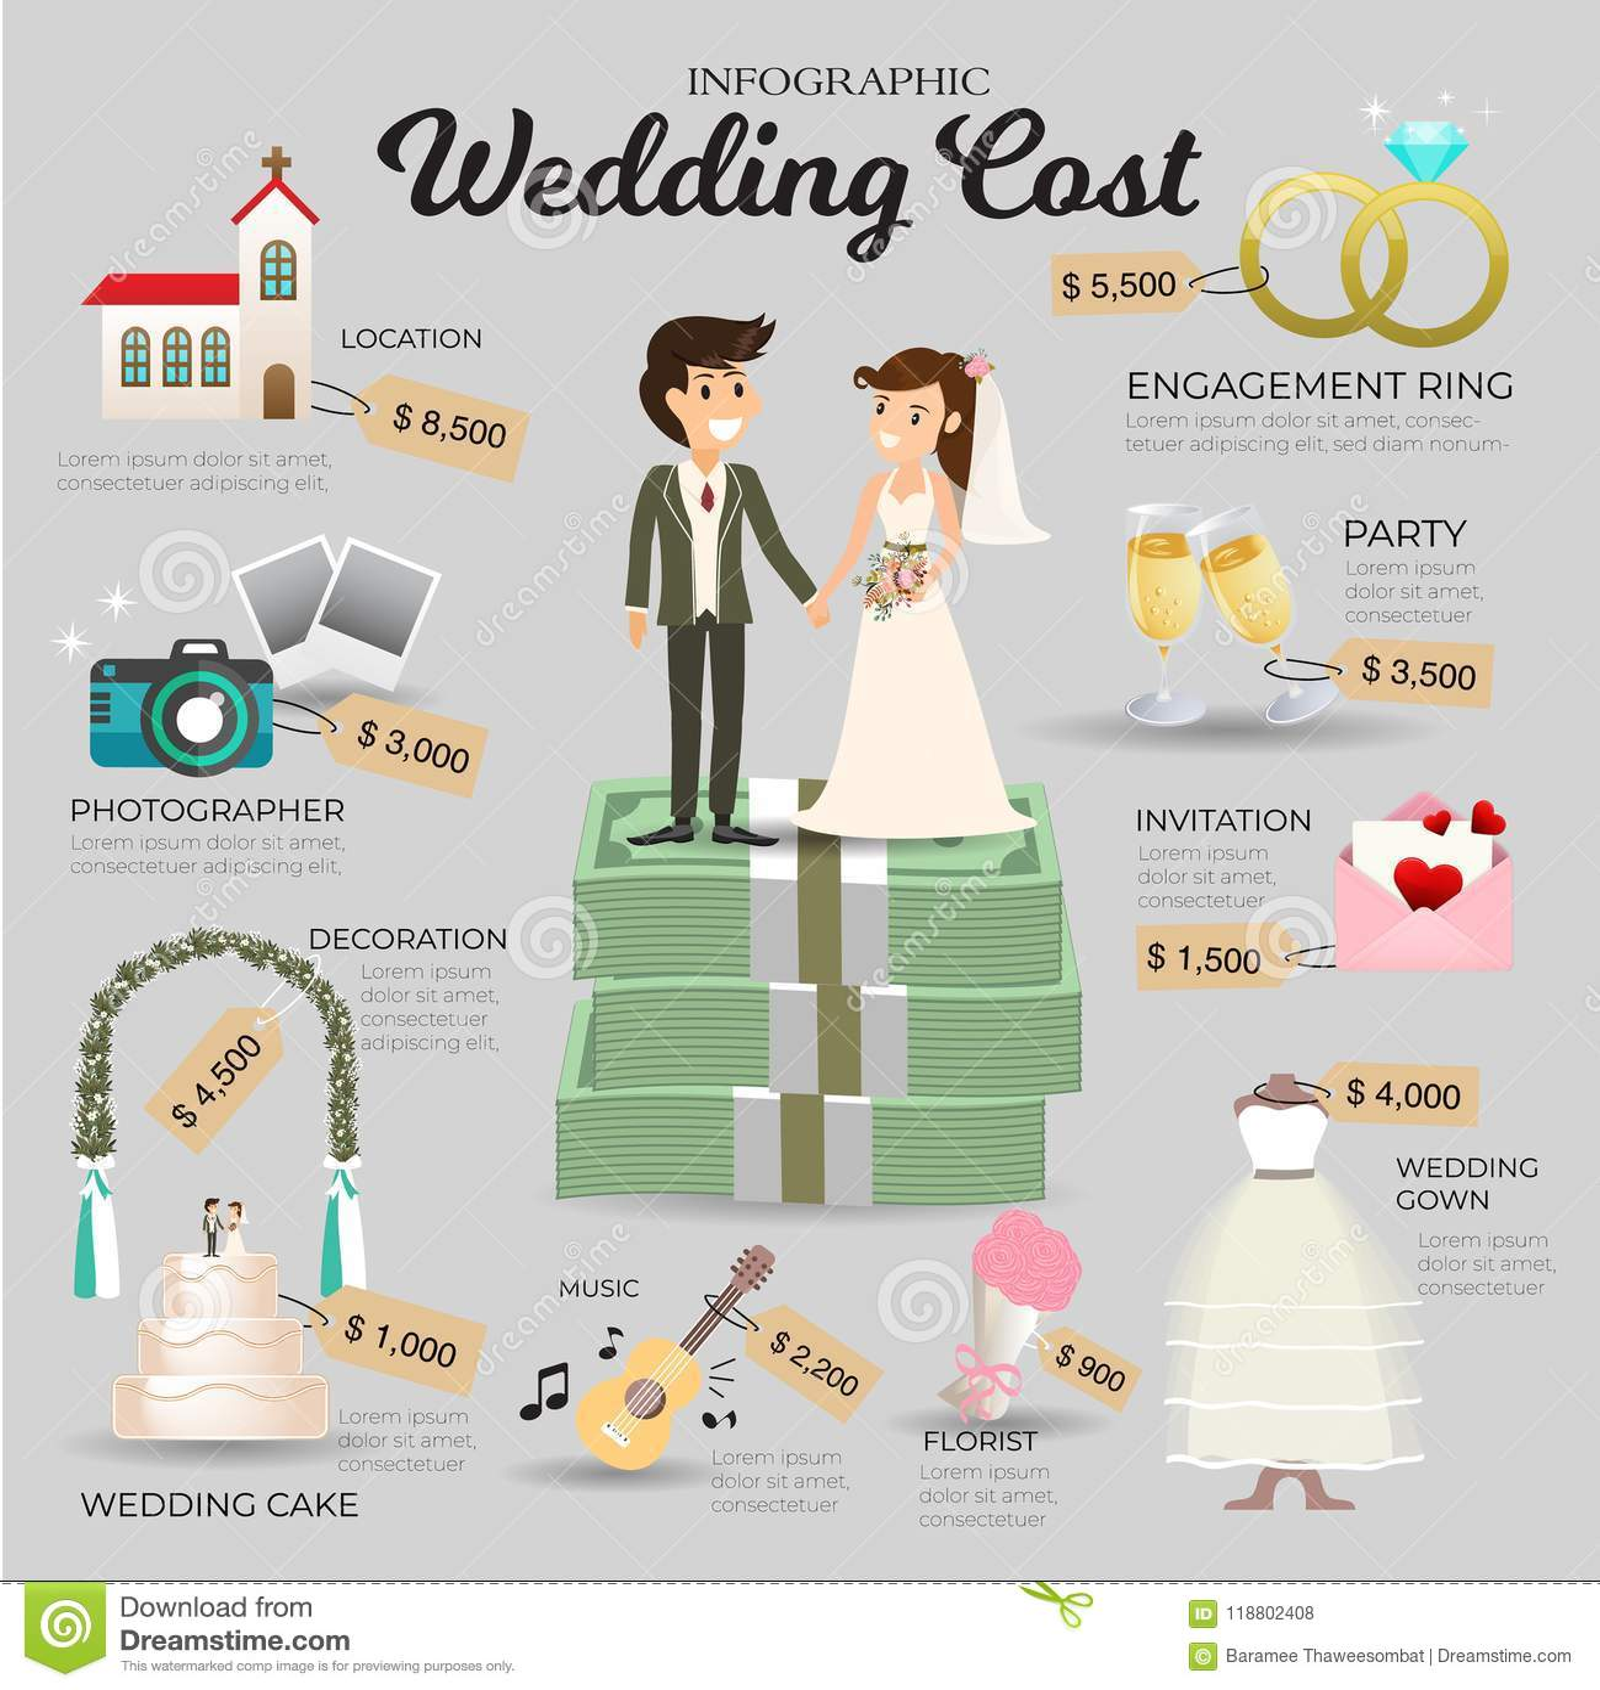 Wedding Cost Infographic.Vector Information. Stock Vector